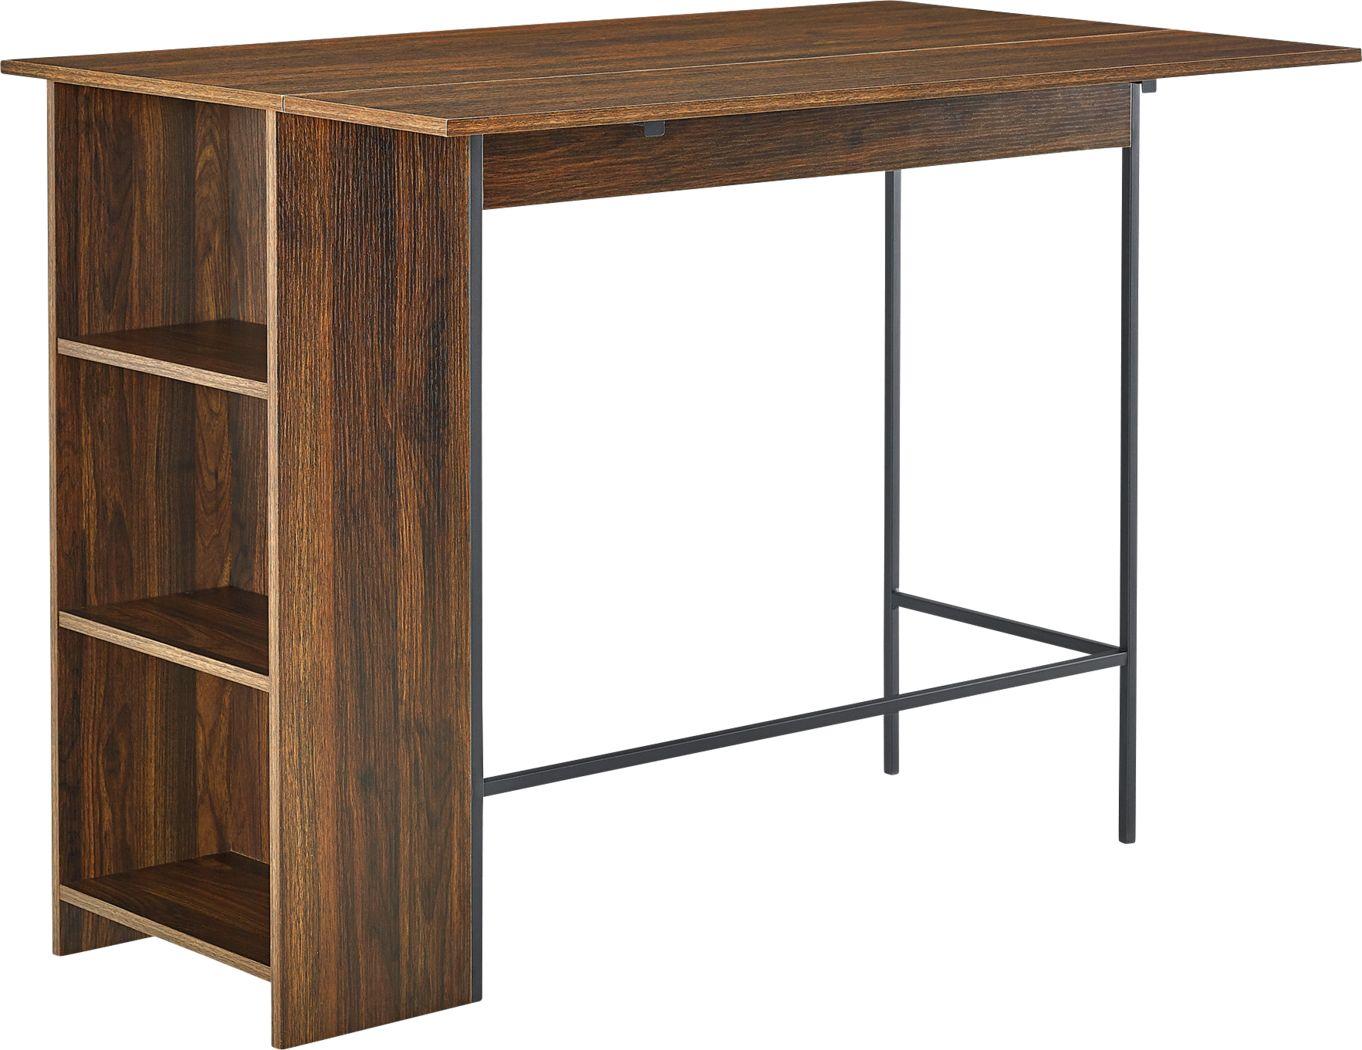 Buritt Walnut Counter Height Table